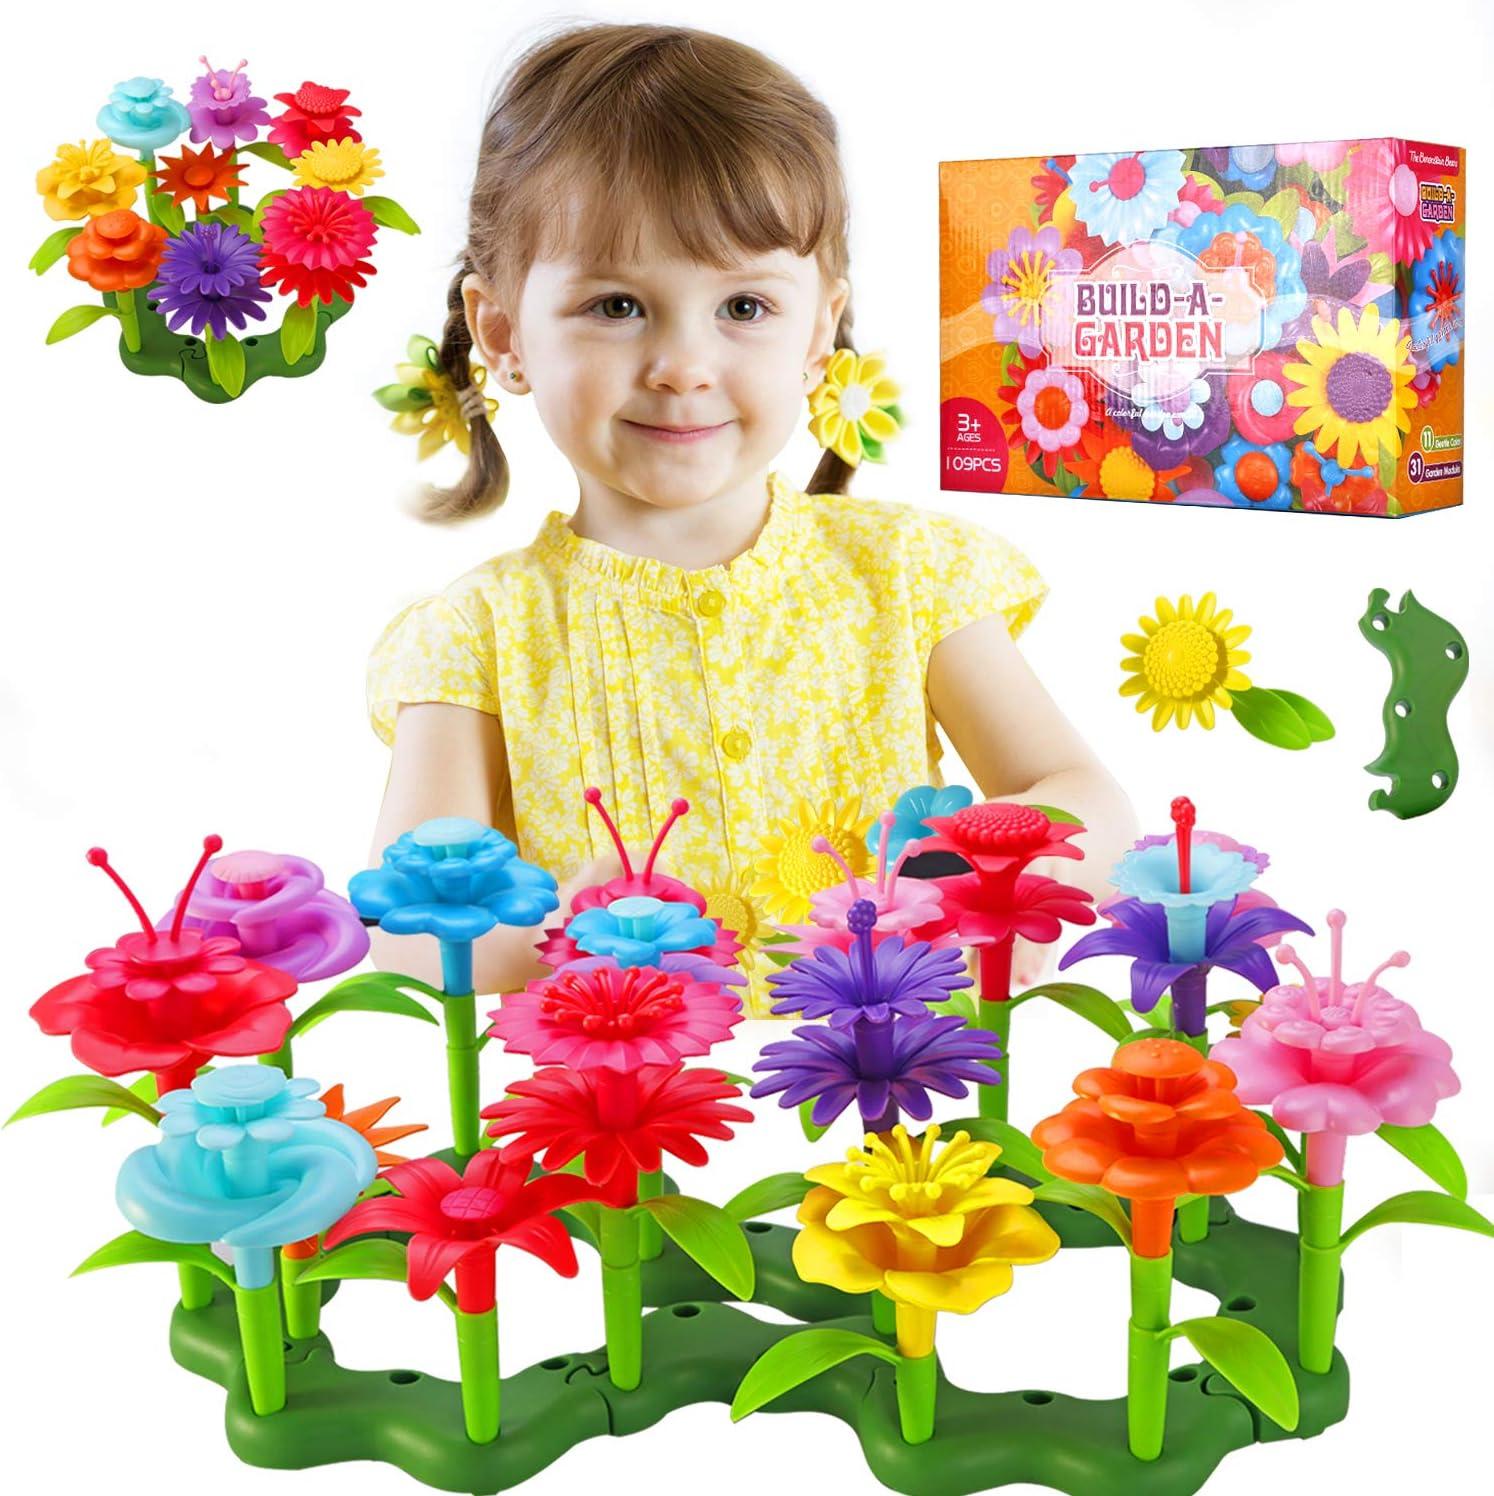 TURN RAISE Flower Garden Building Toys for Girls,109 Pcs Garden Bouquet Blocks,Creative Educational Stem Toys for for Preschool Children Age 3 4 5 6 7 Year Old (Style-1)